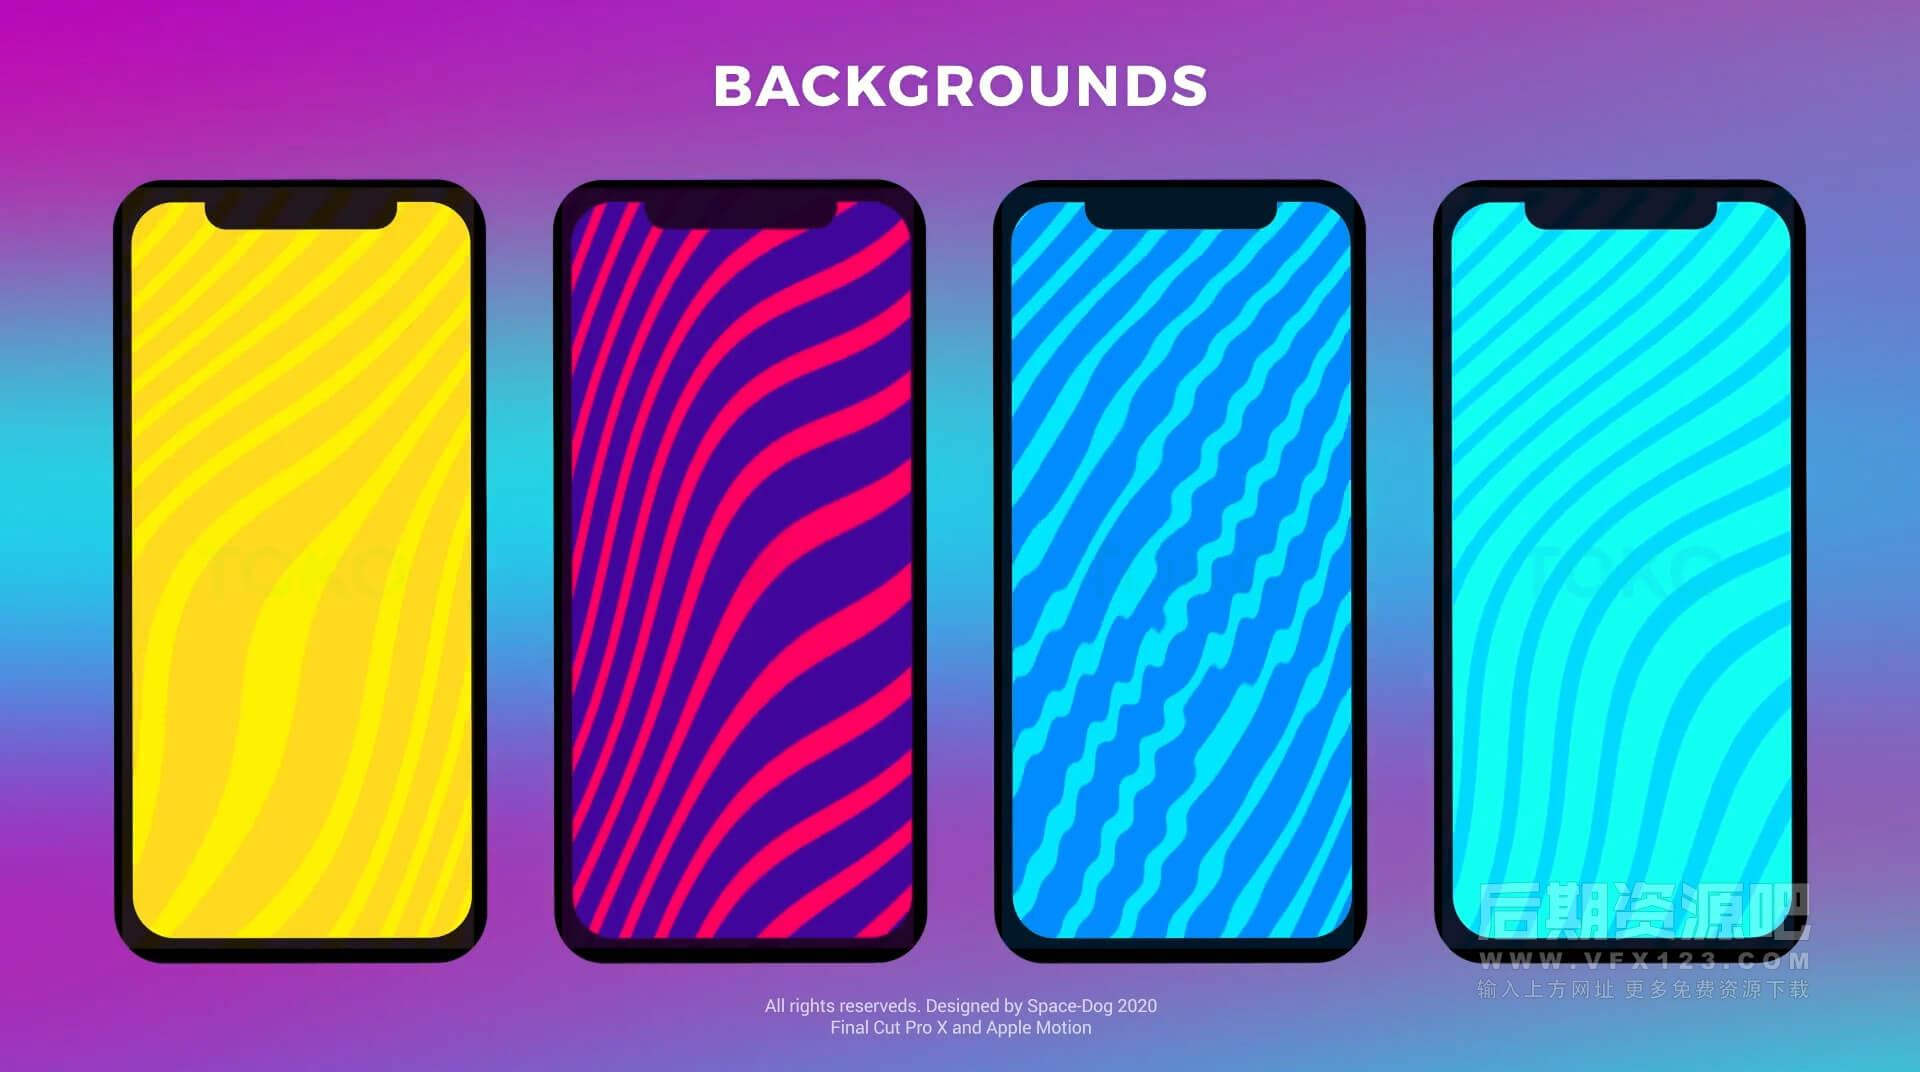 Fcpx插件 竖屏模板适用手机短视频标题背景图形包 Instagram Graphics Pack